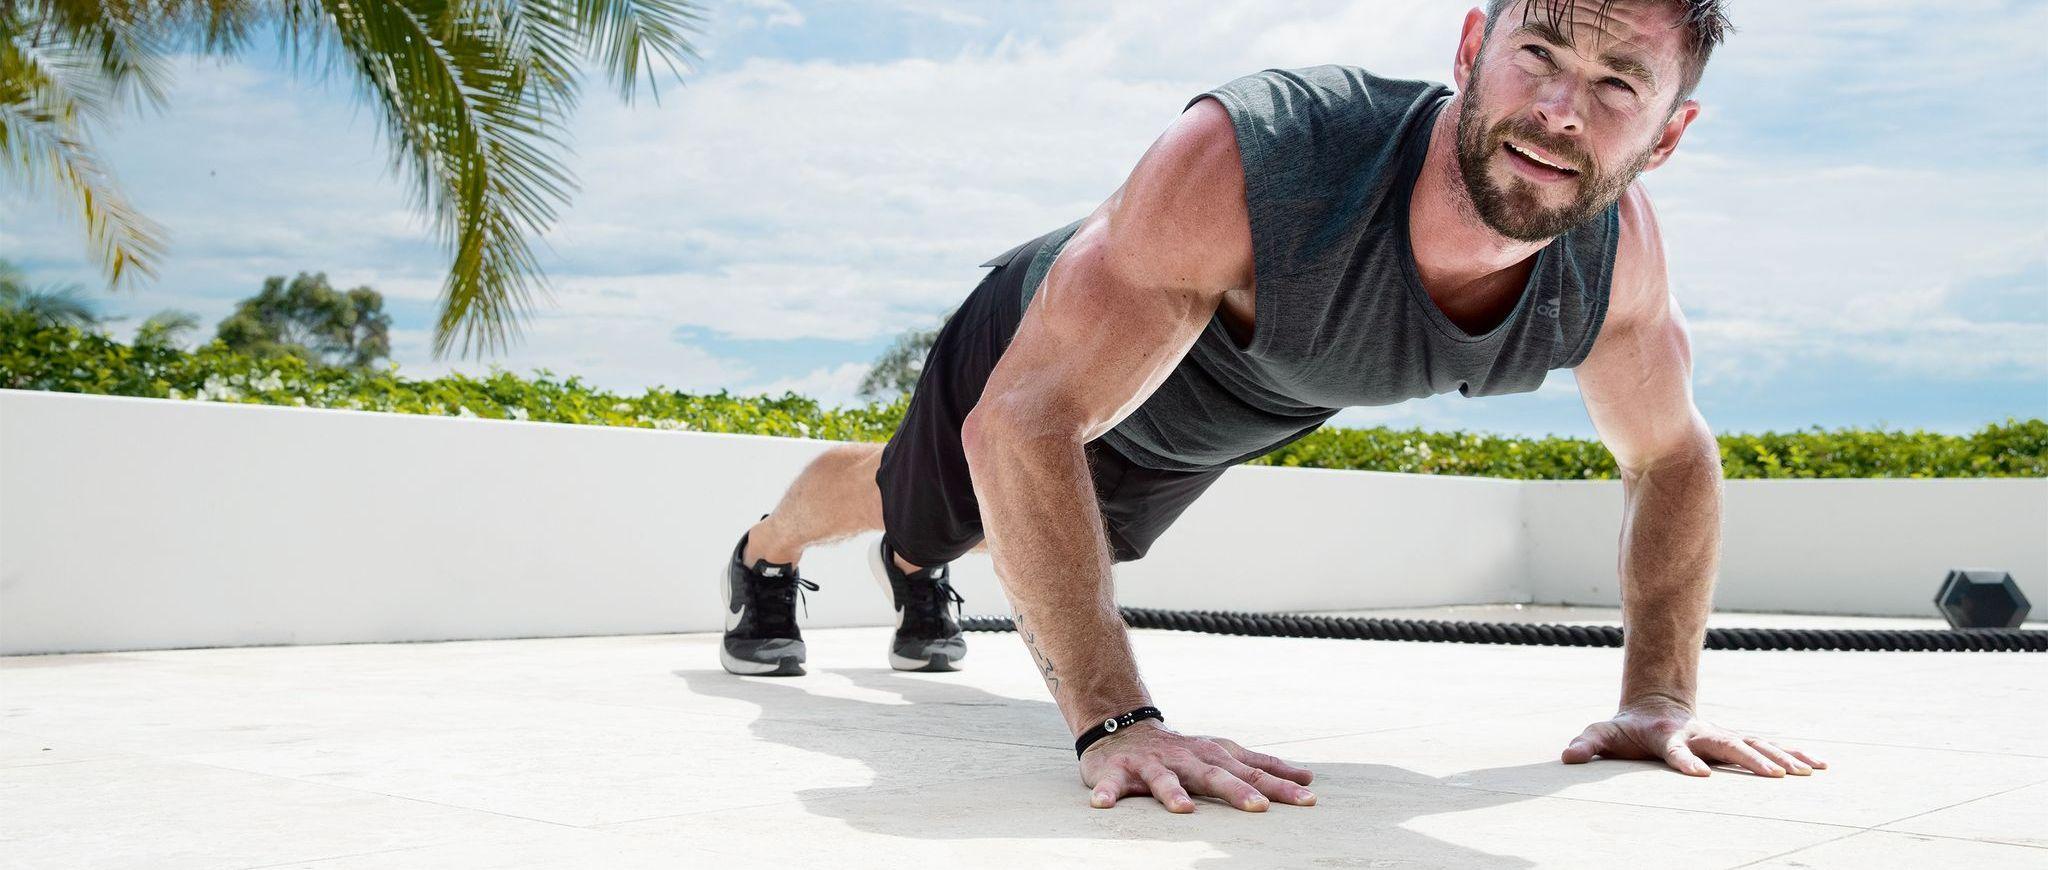 Chris Hemsworth muscle